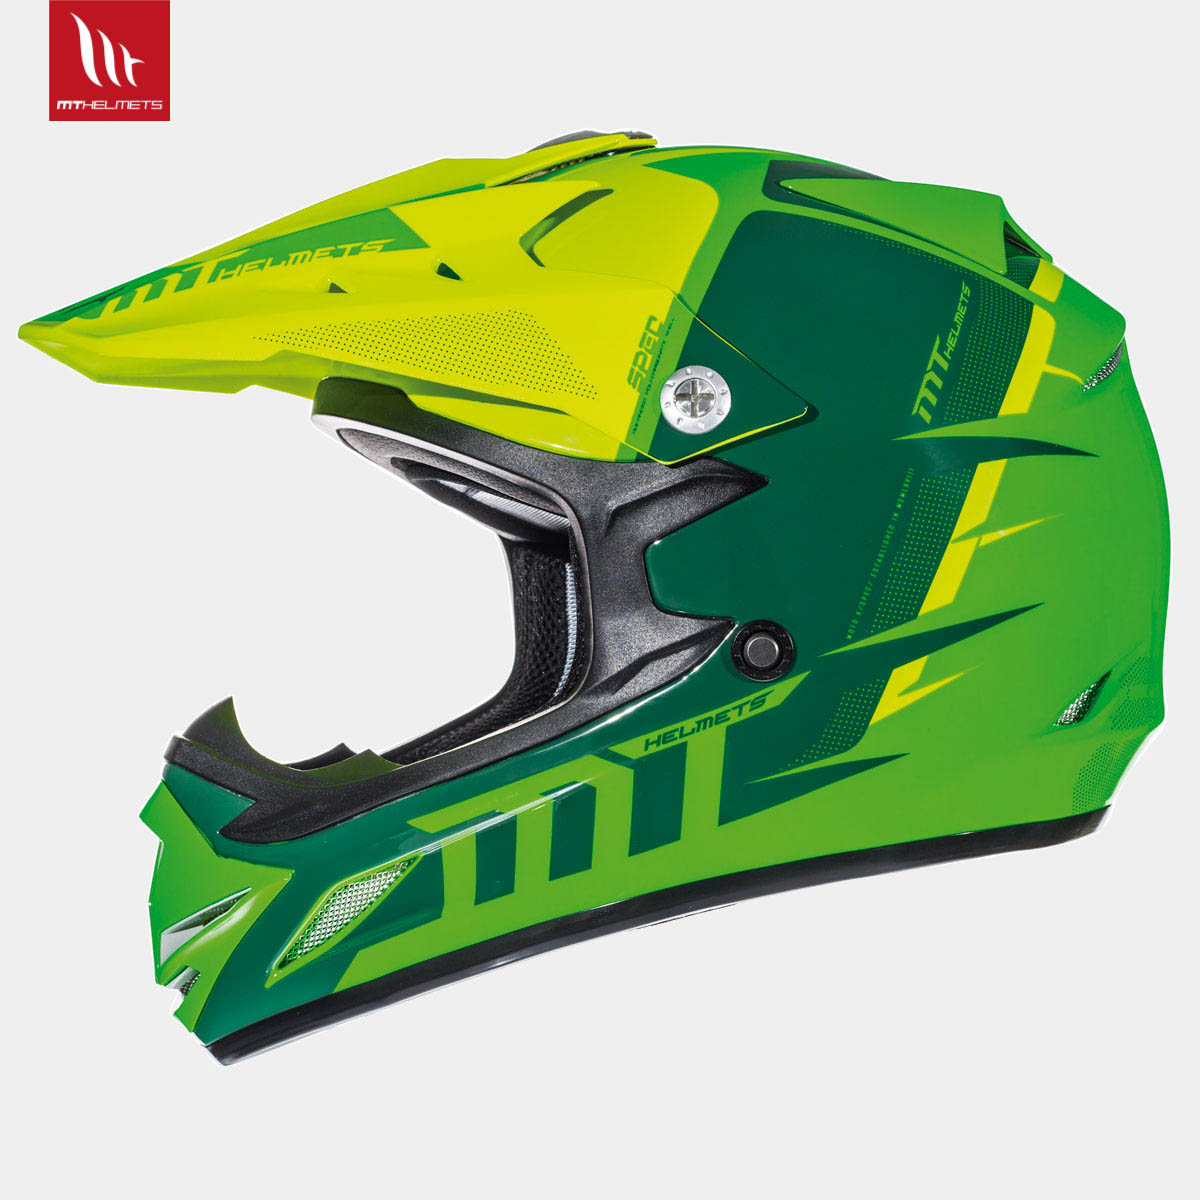 MT Synchrony Spec Gloss Fluor Green/Fluor Yellow